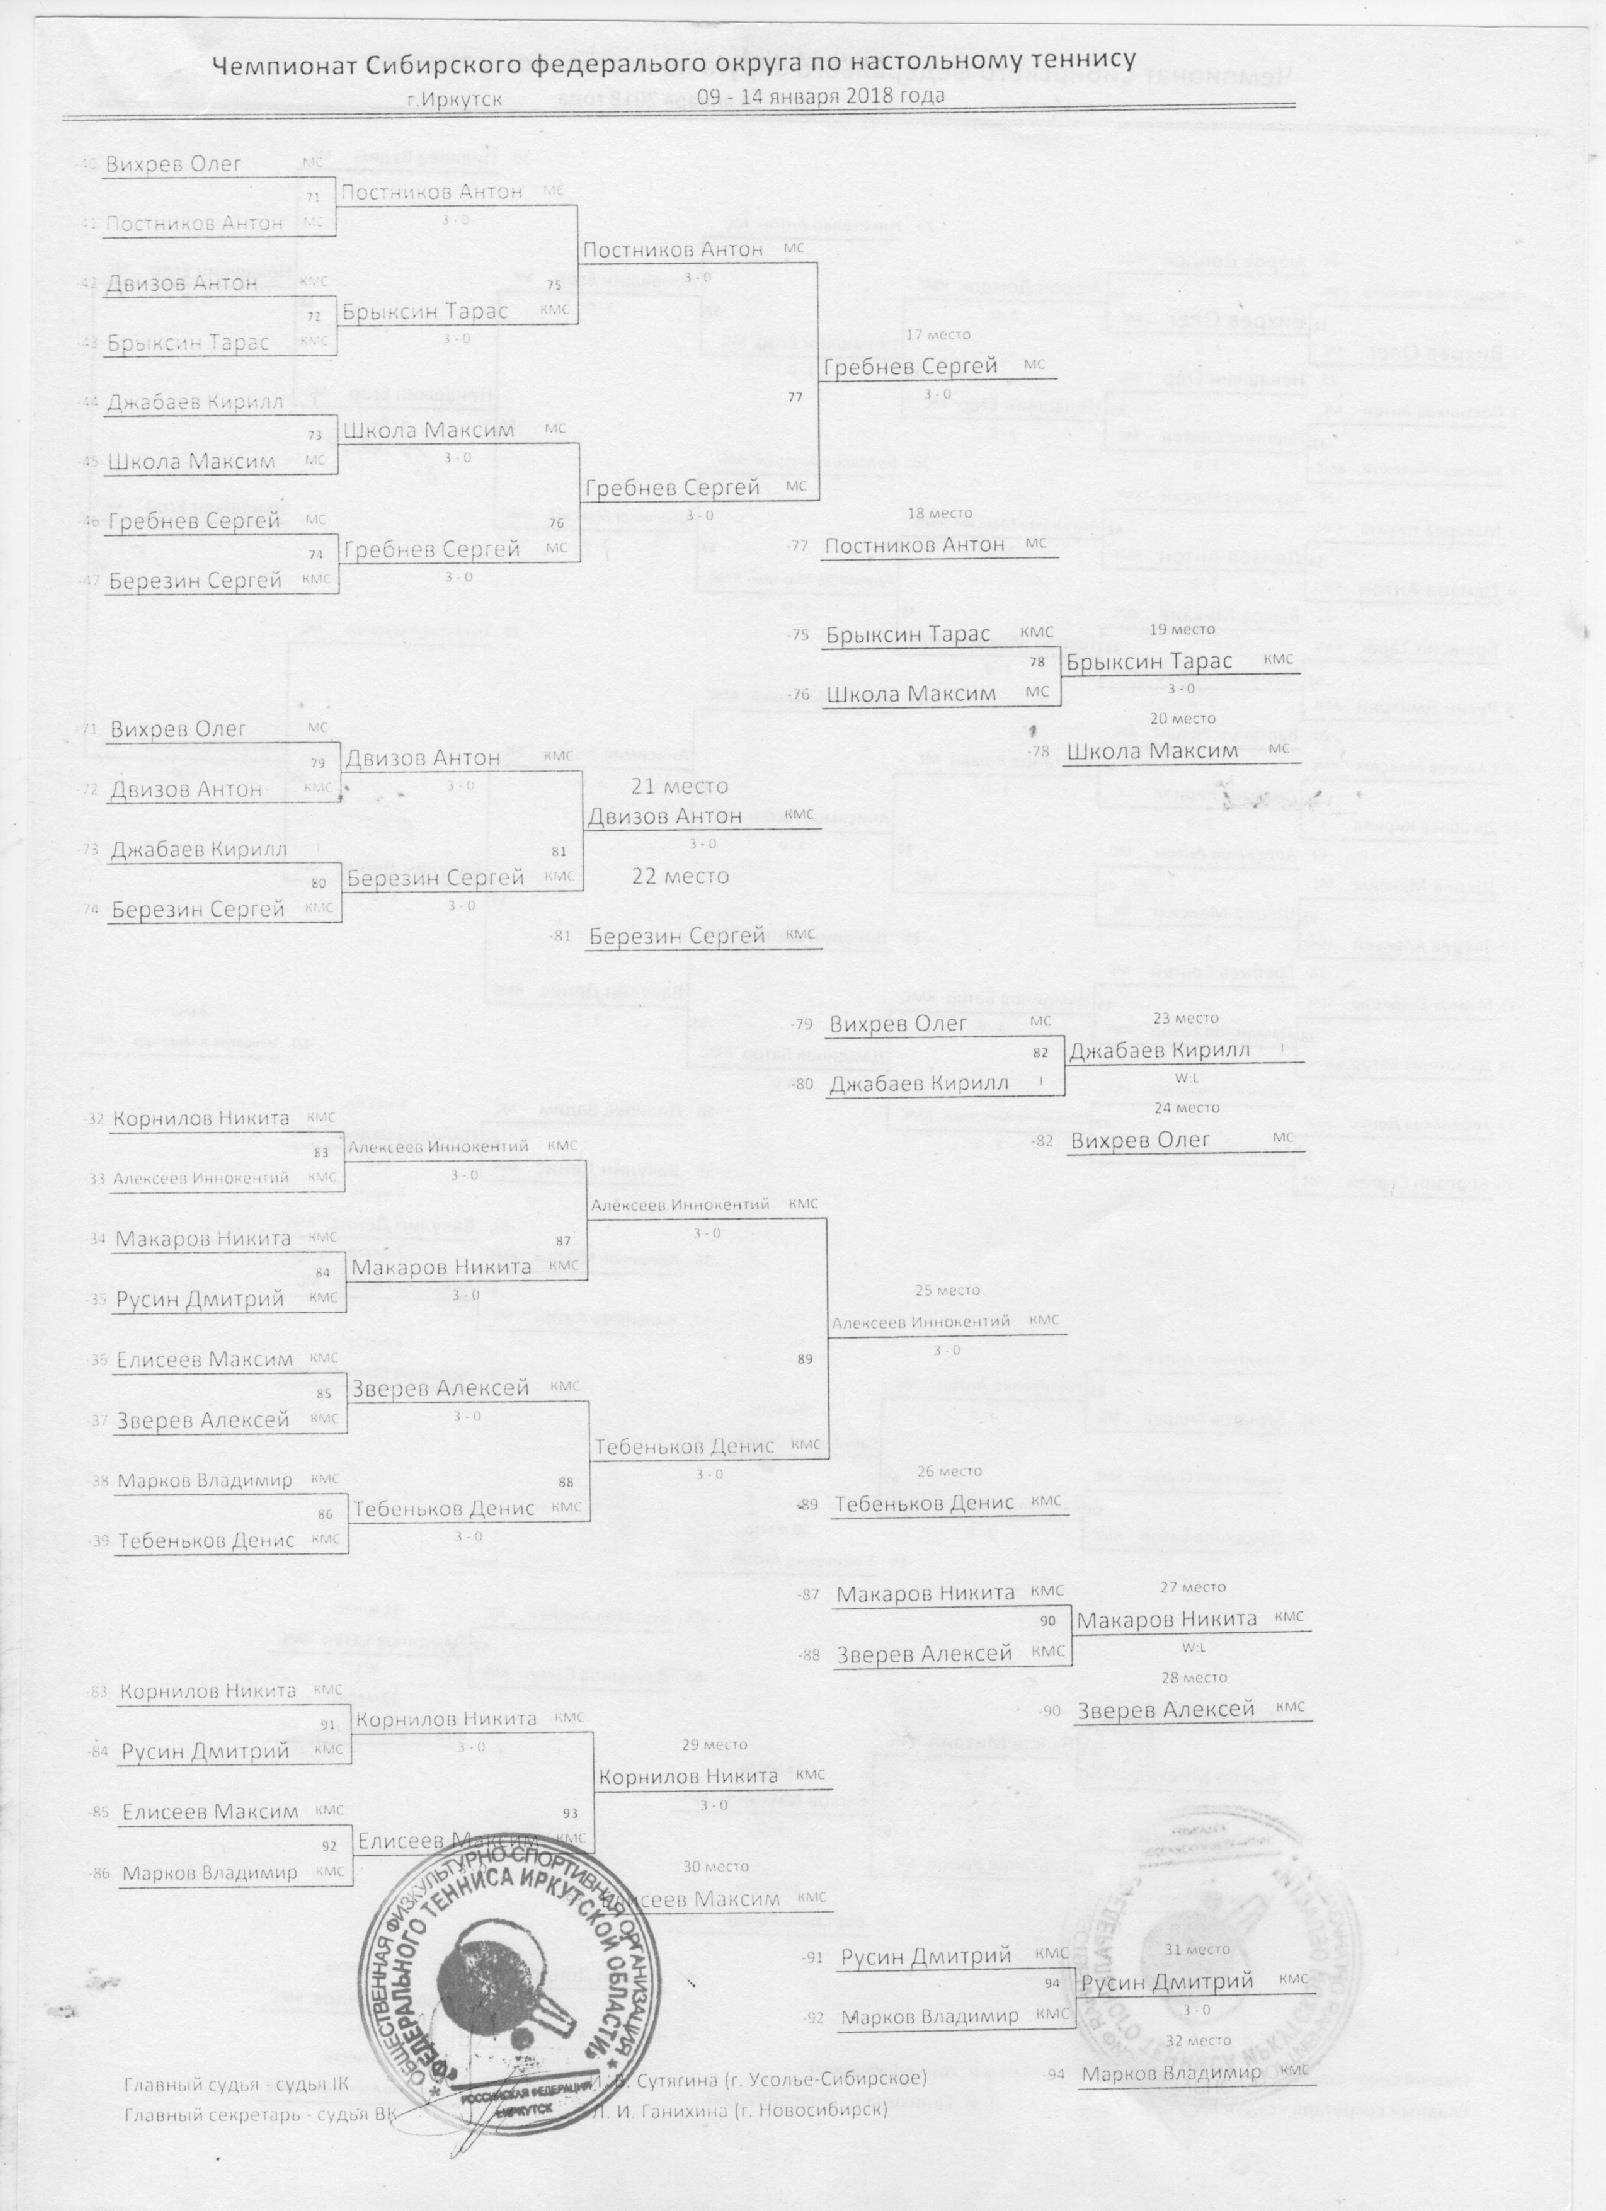 Чемпионат СФО 2018 - Страница 4 0203953001517581285